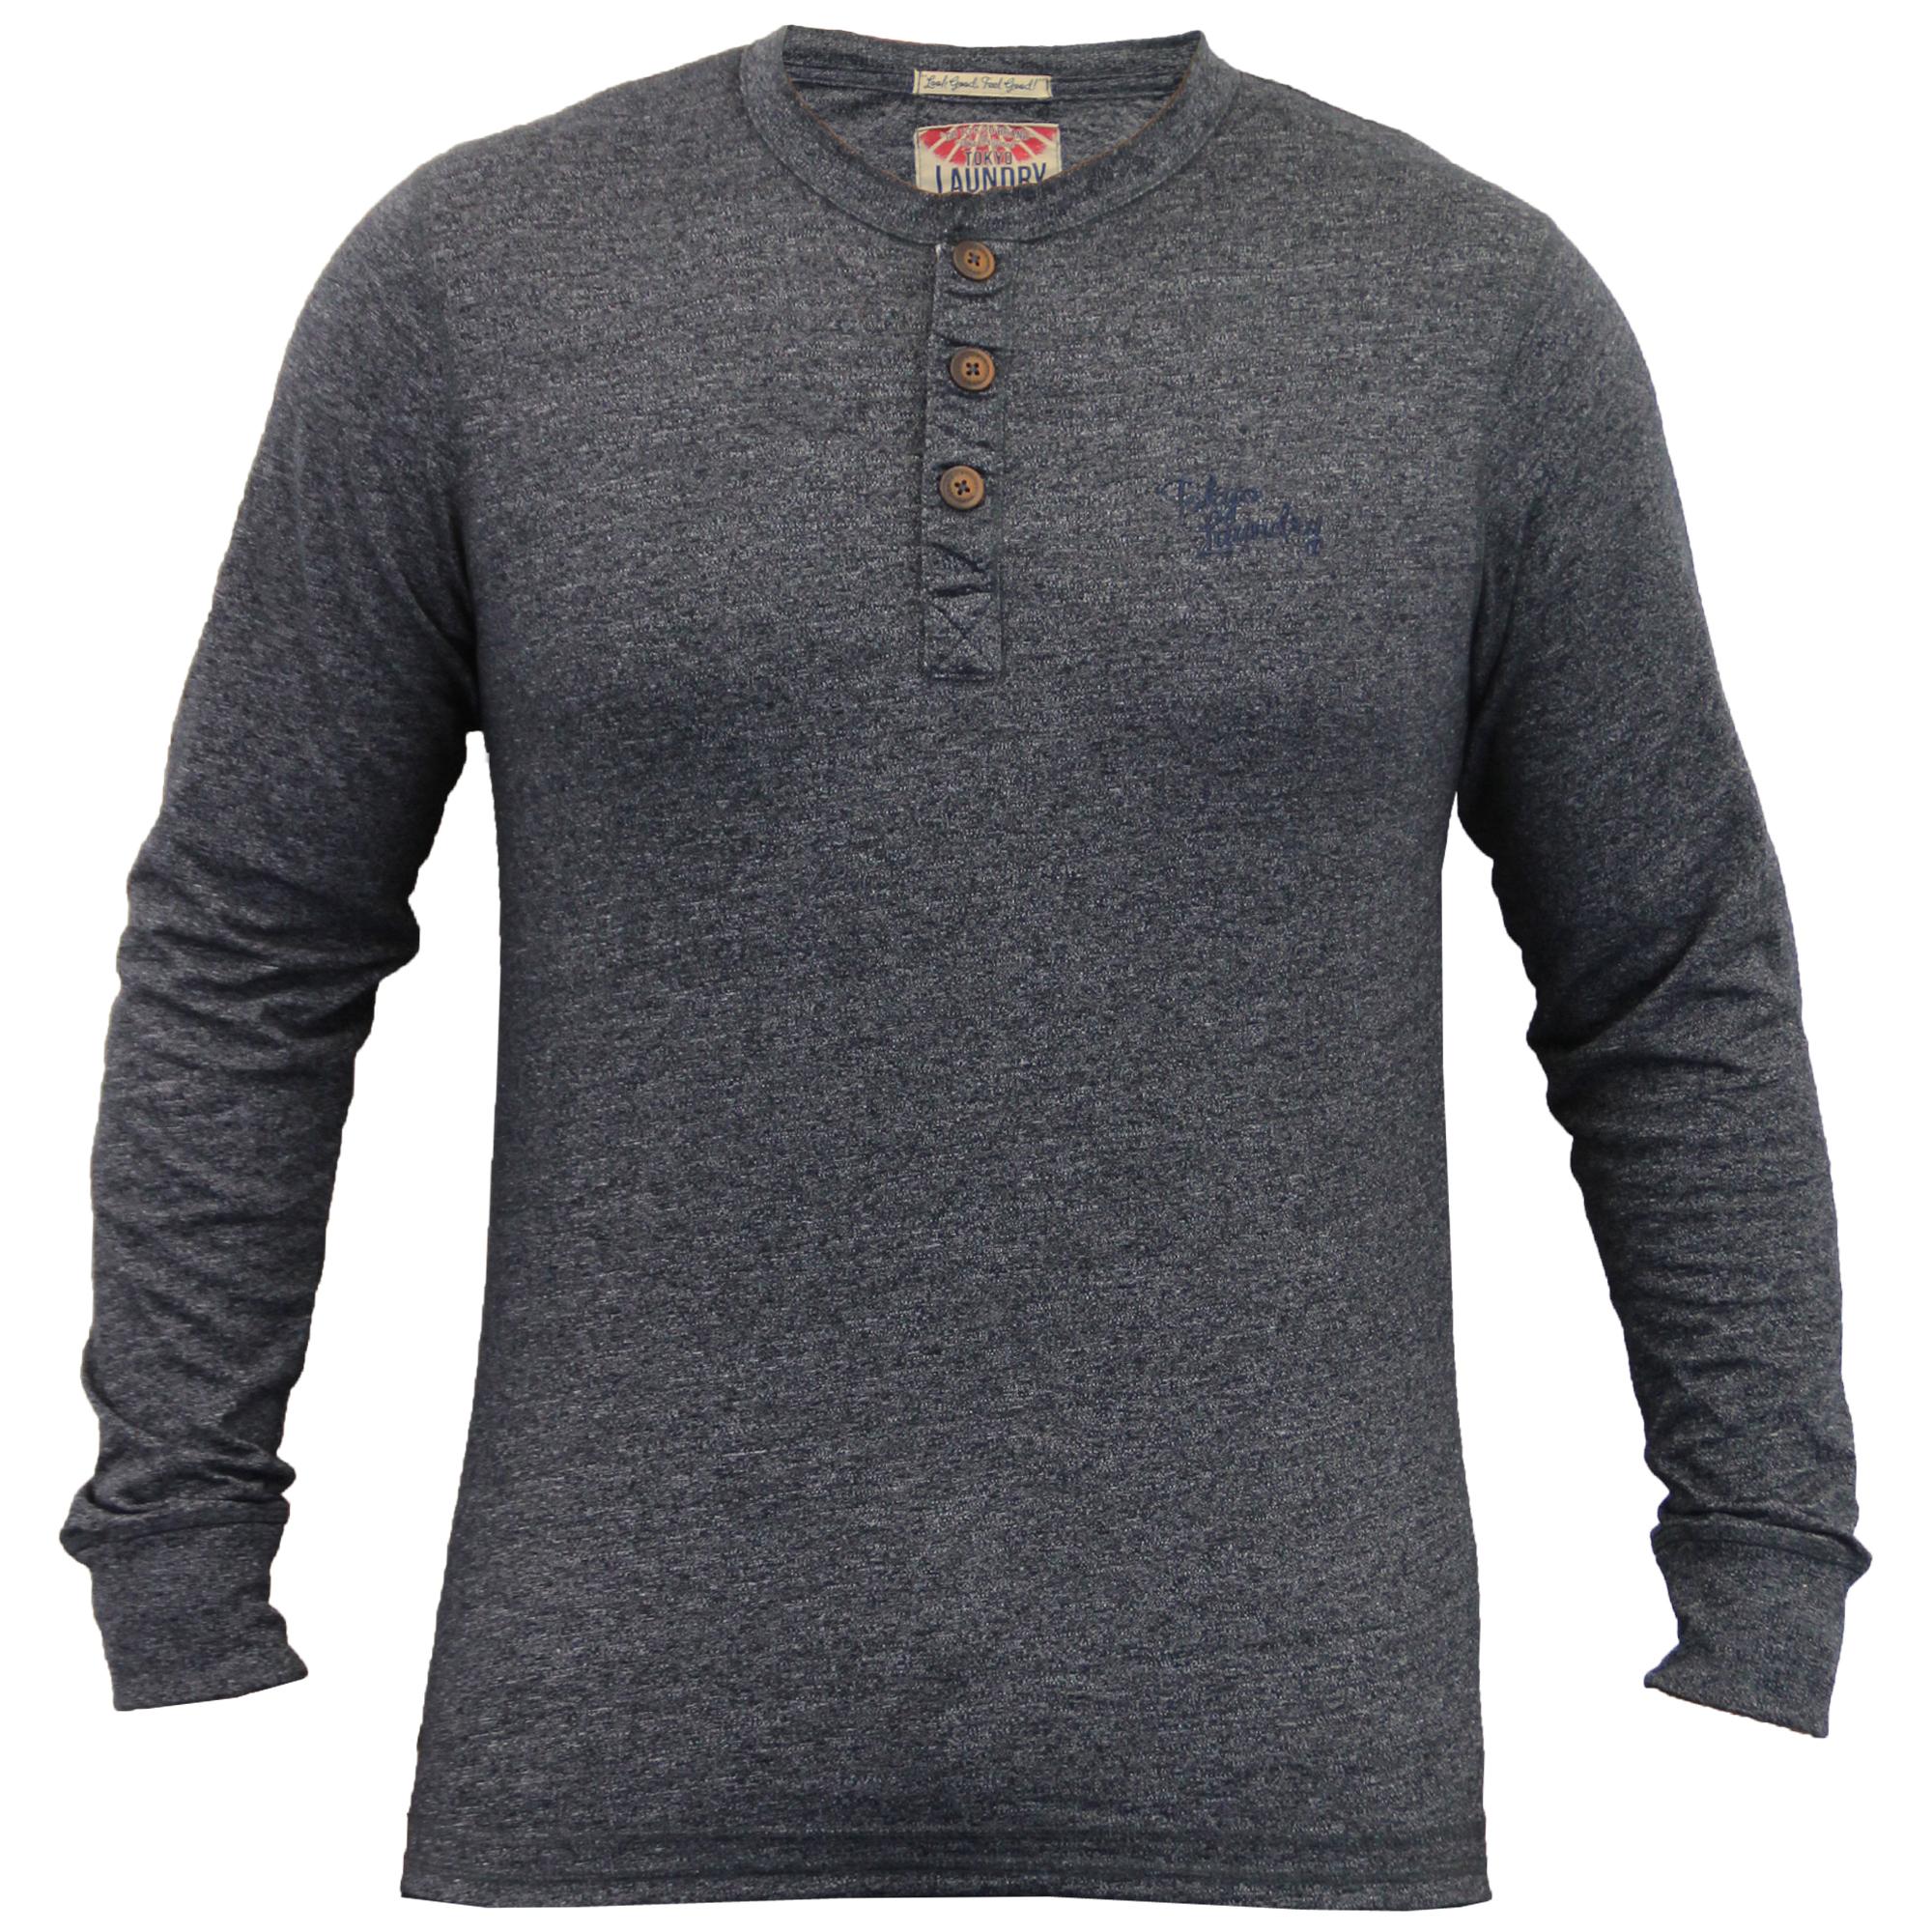 Tokyo-Laundry-Jersey-Top-Para-Hombre-Camiseta-Manga-larga-Cuello-Abuelo-Boton-De-Invierno